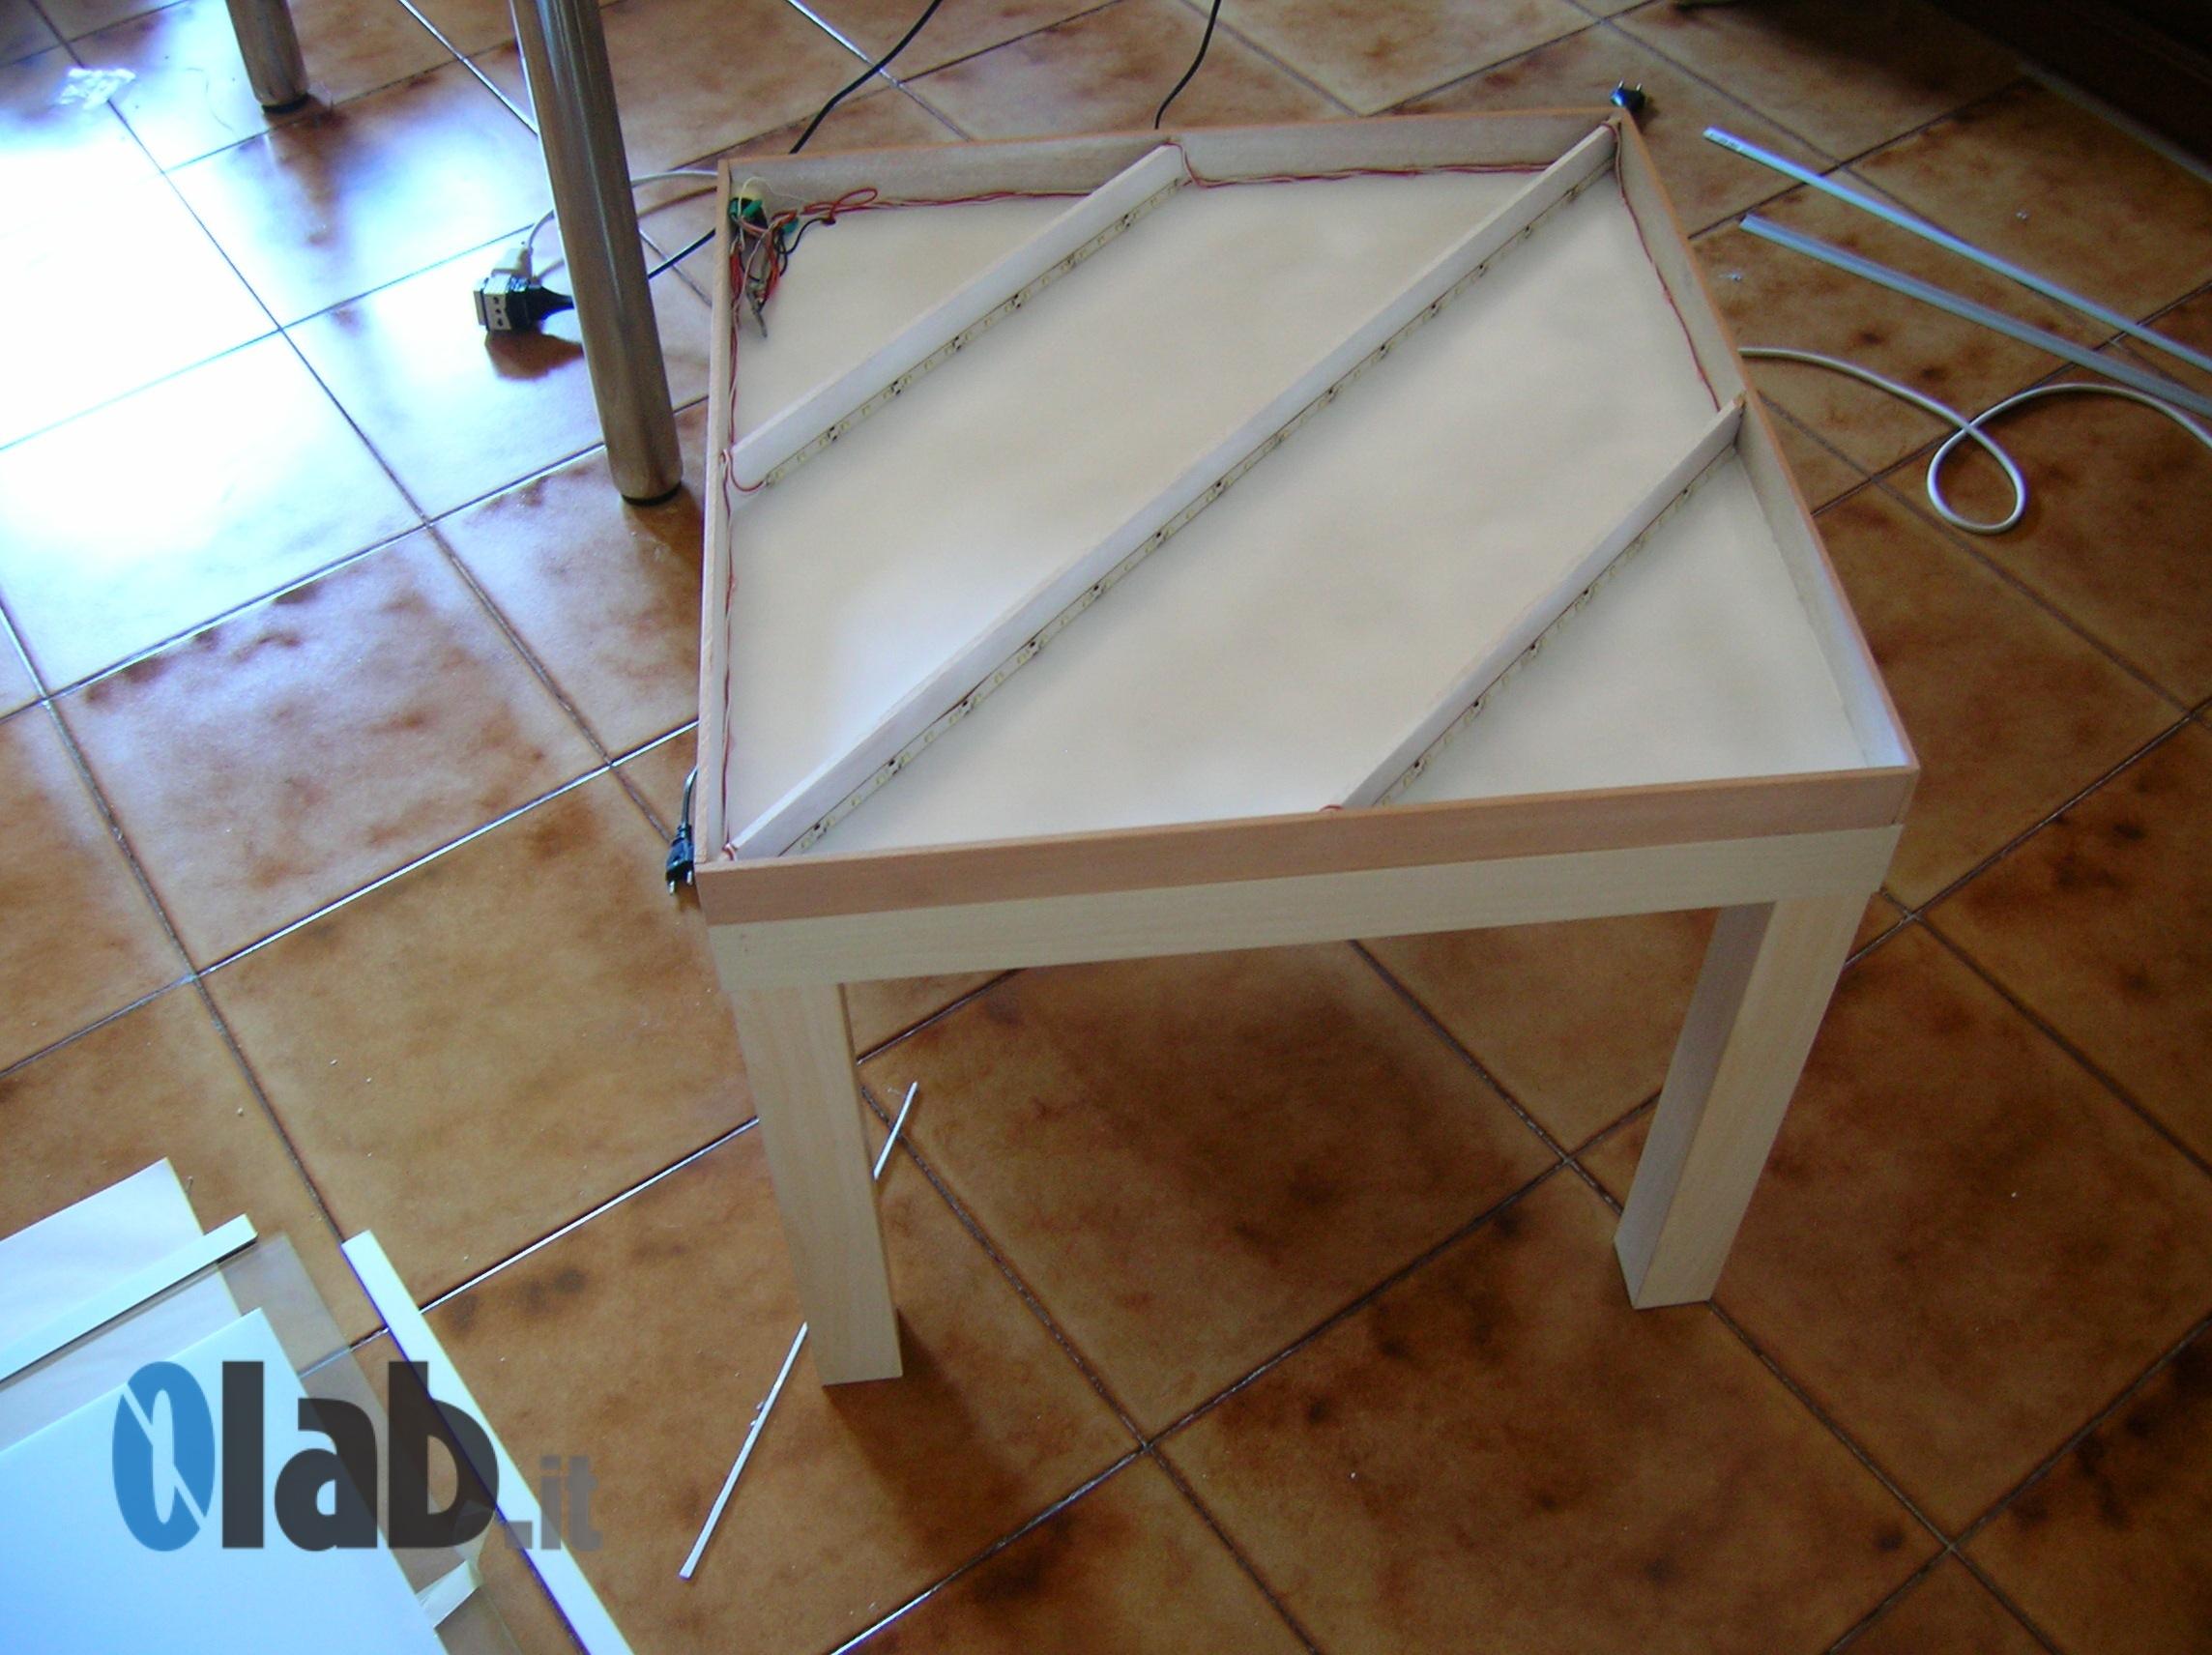 Tavolino Che Diventa Tavolo Ikea ikea hack - lack a programmable led table || 0lab.itarduino